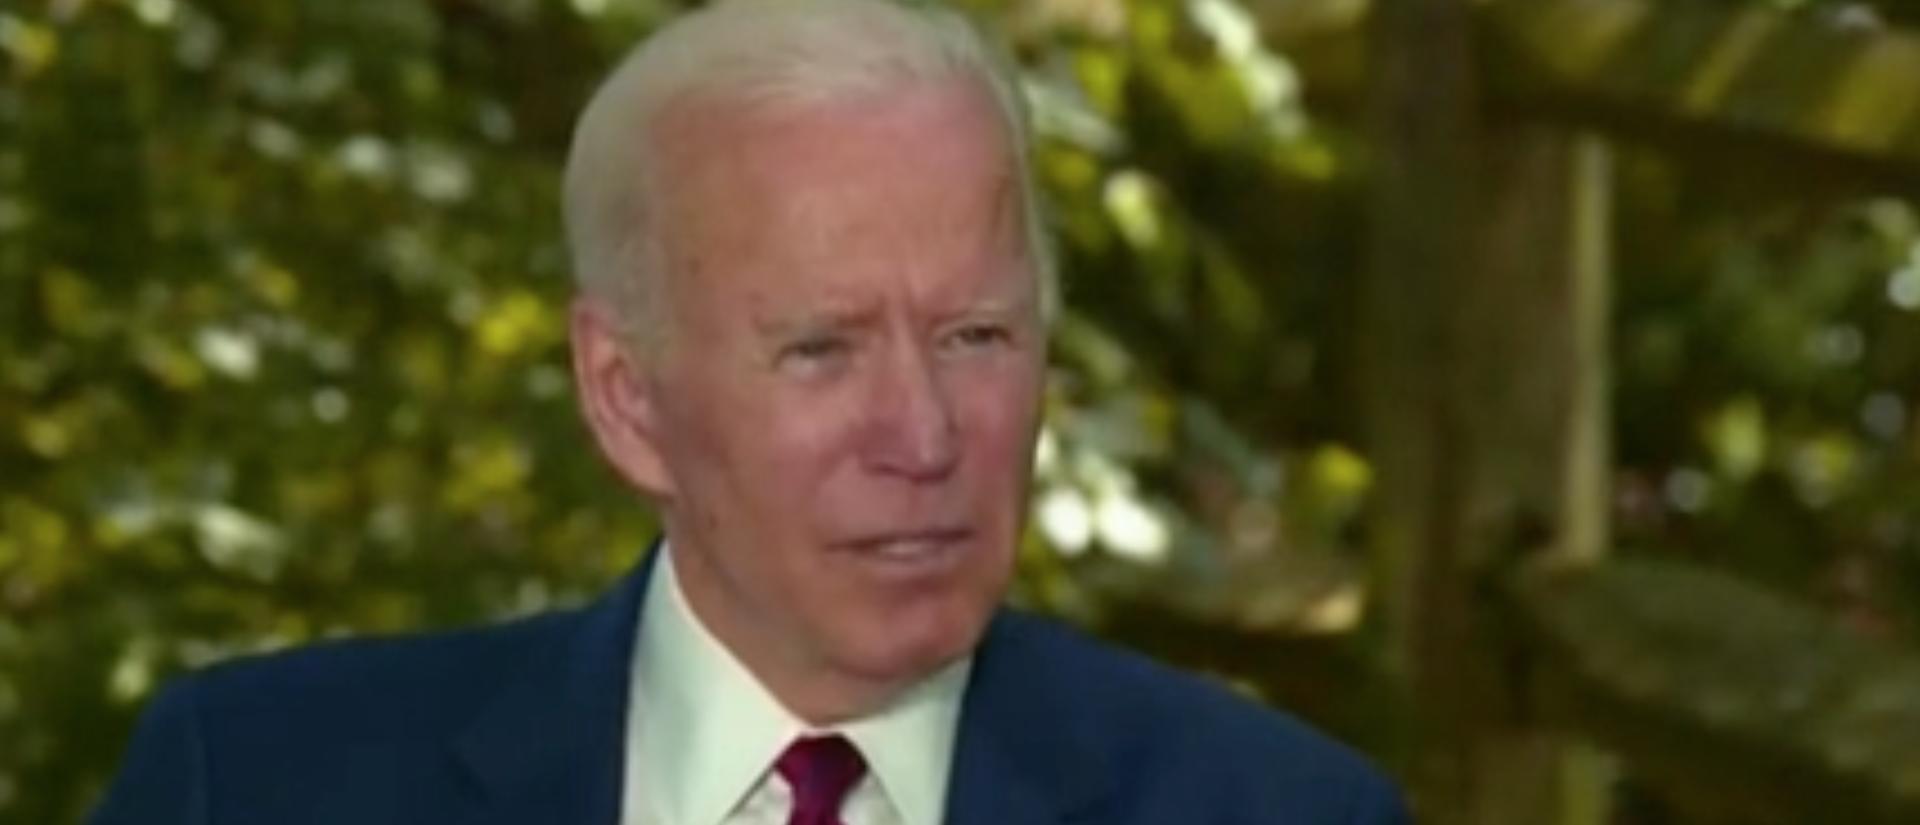 Without Evidence, Joe Biden Blames Nearly Half Of...